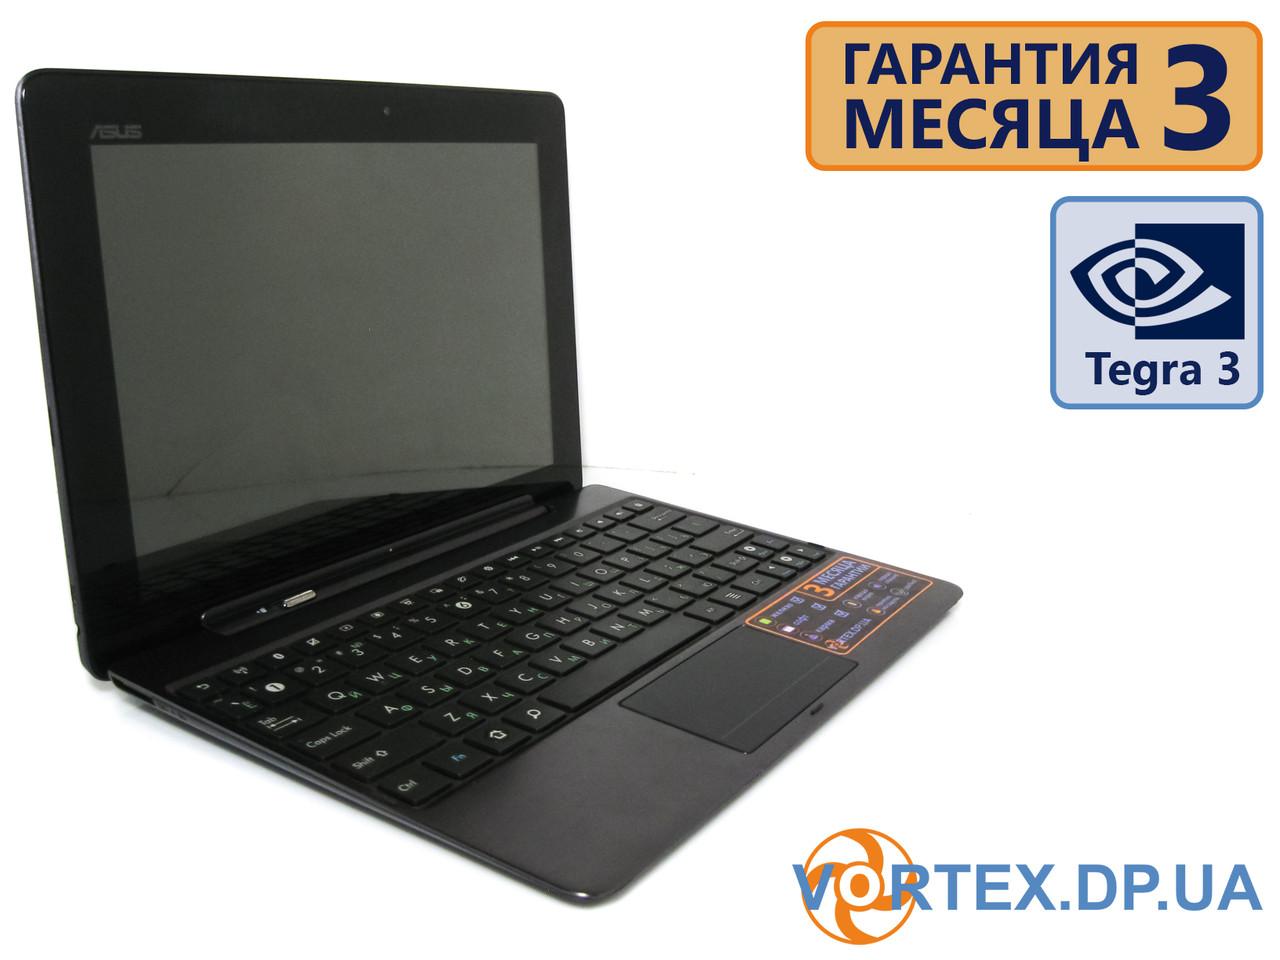 Трансформер+клавиатура Android  ASUS TF700T 10,1 (1920х1200) / NVIDIA